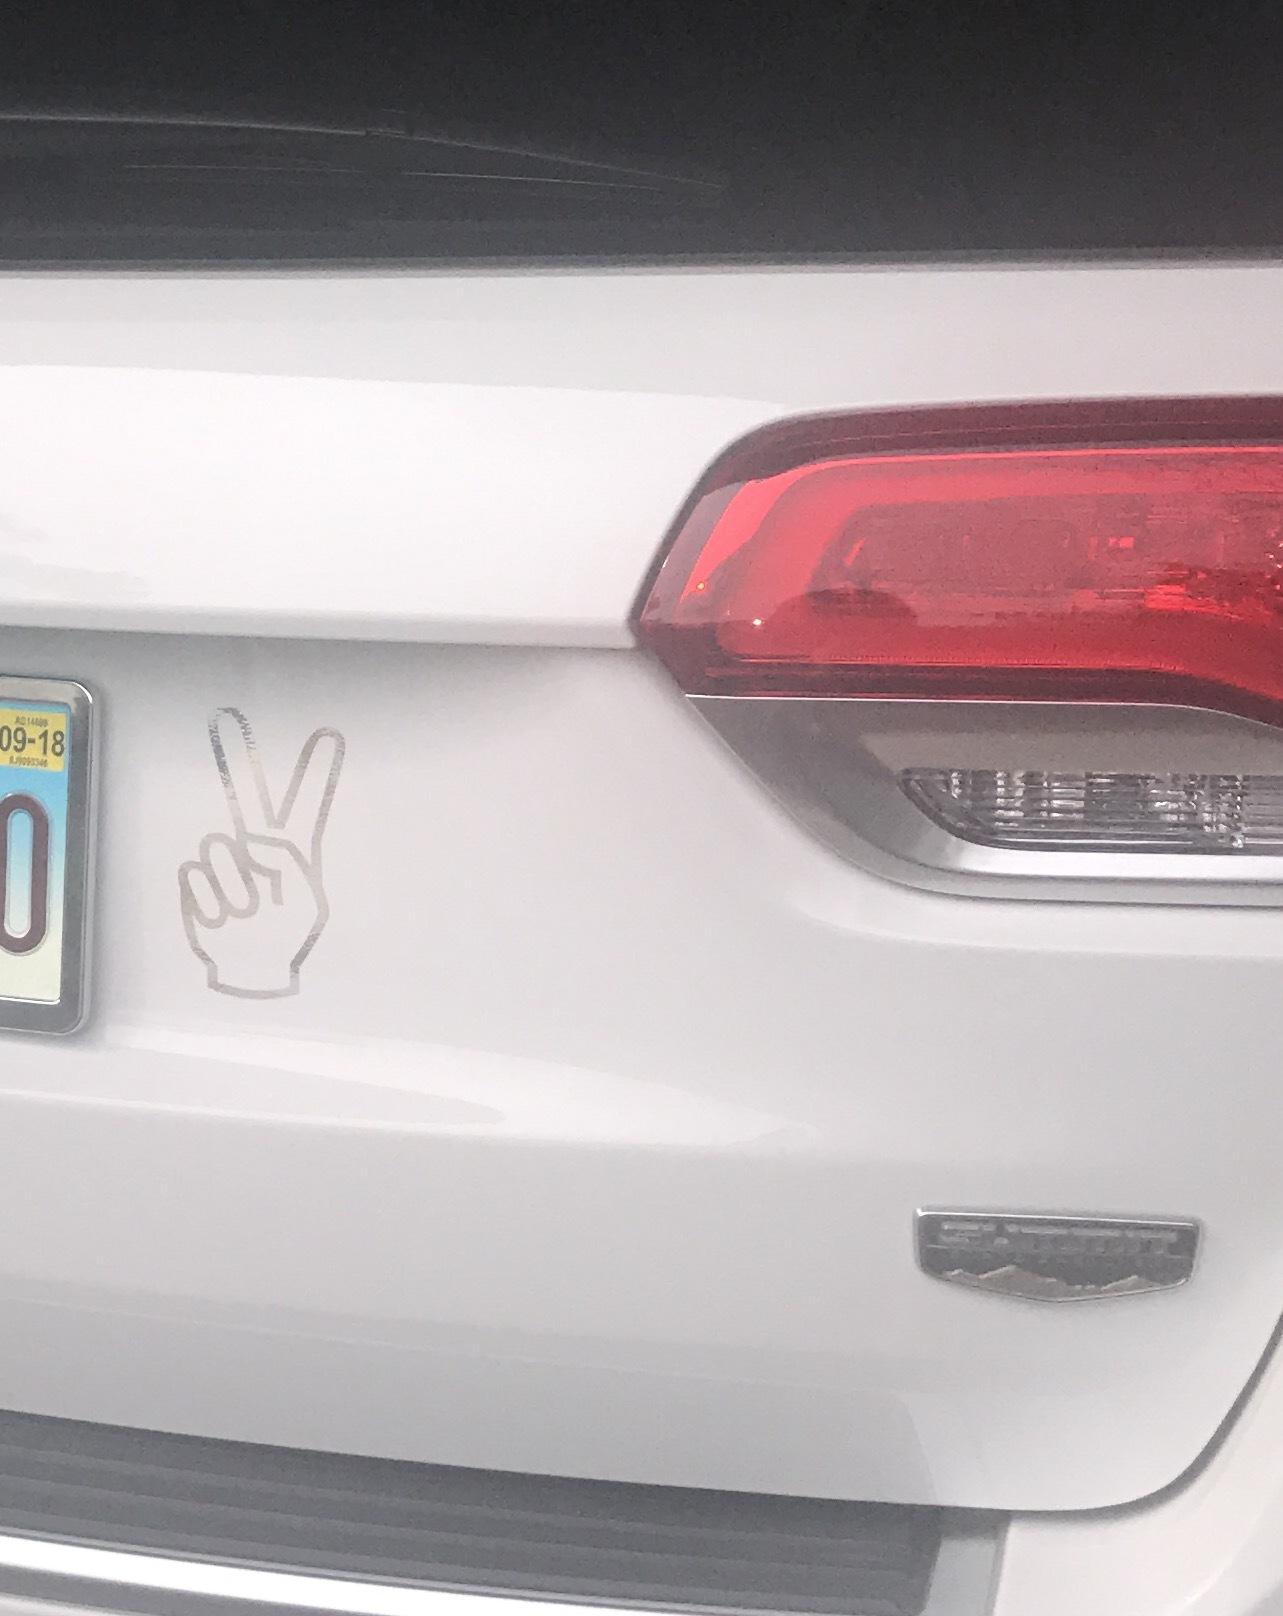 Jennifer's photograph of their Peace Sign Sticker